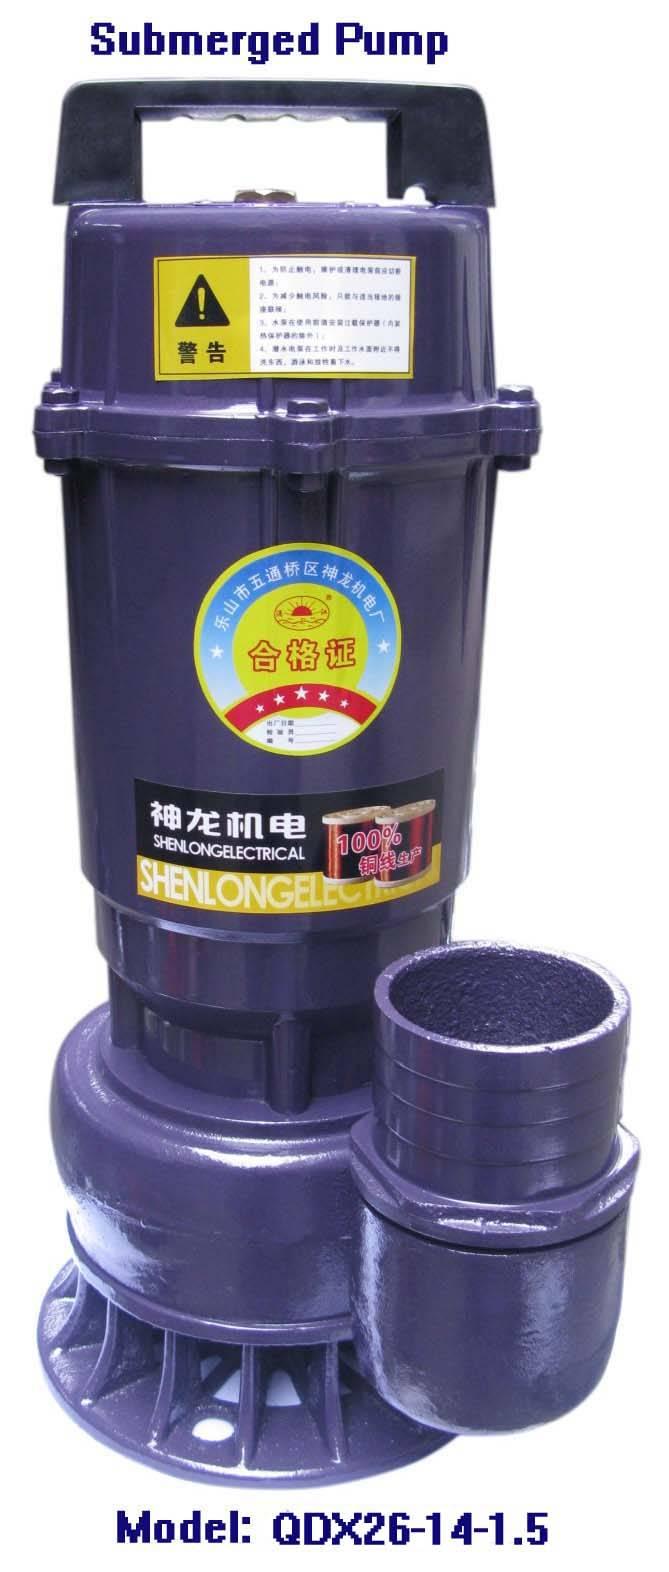 Electric Submerged Pump-QDX26-14-1.5